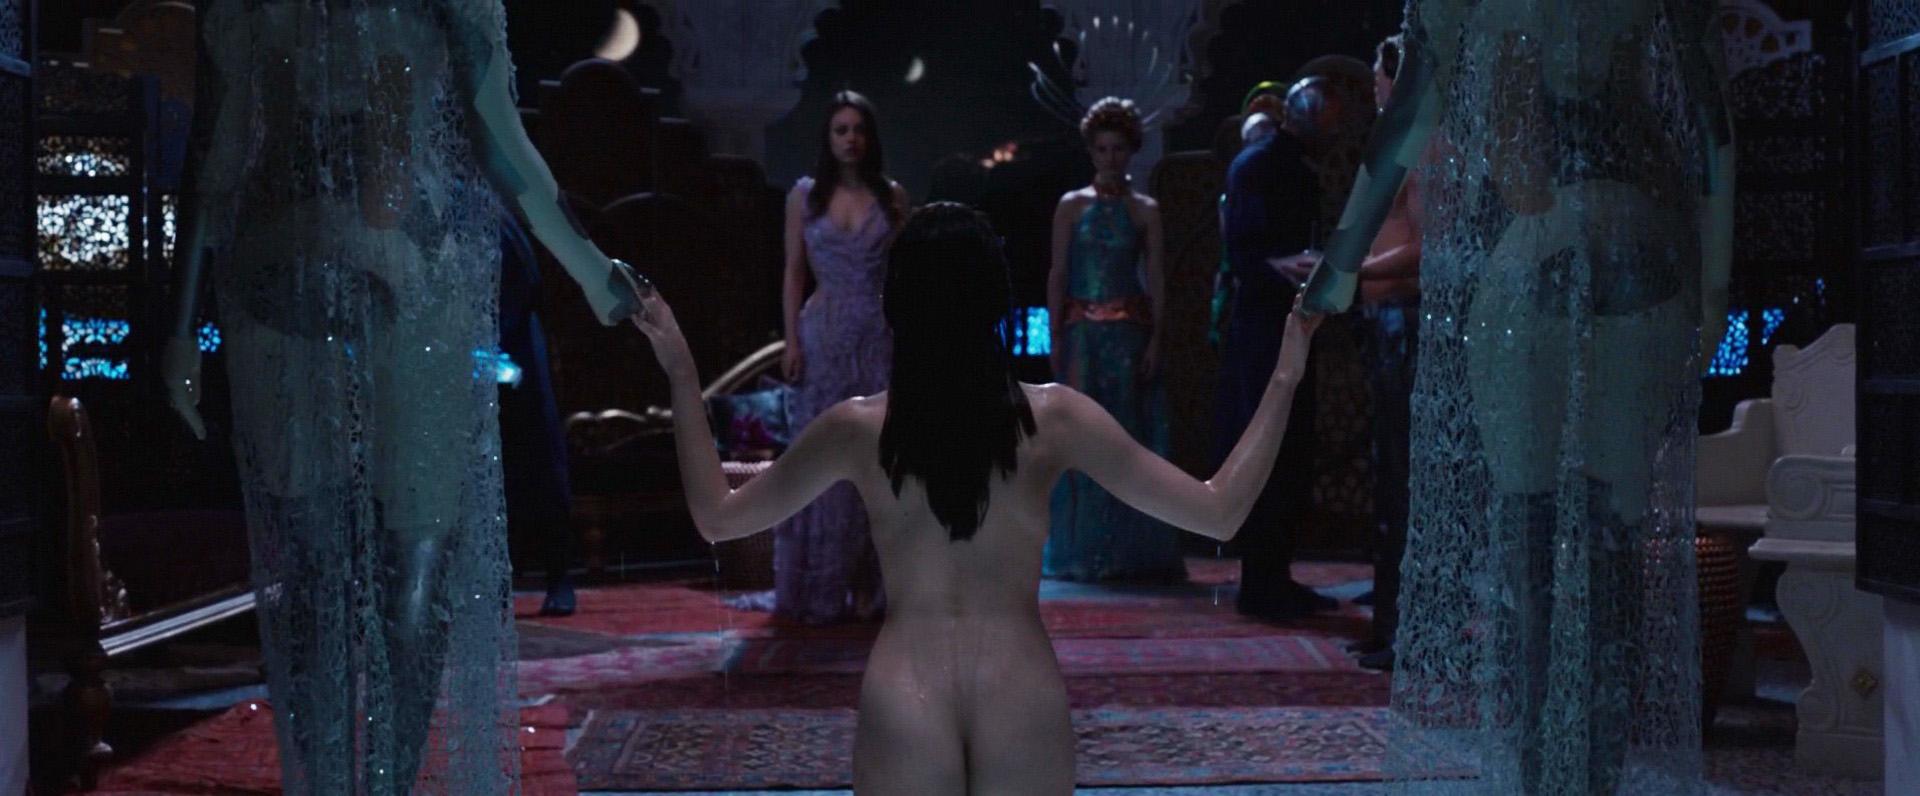 Tits Ashlen Alexandra nudes (67 photos), Sexy, Bikini, Instagram, cameltoe 2019